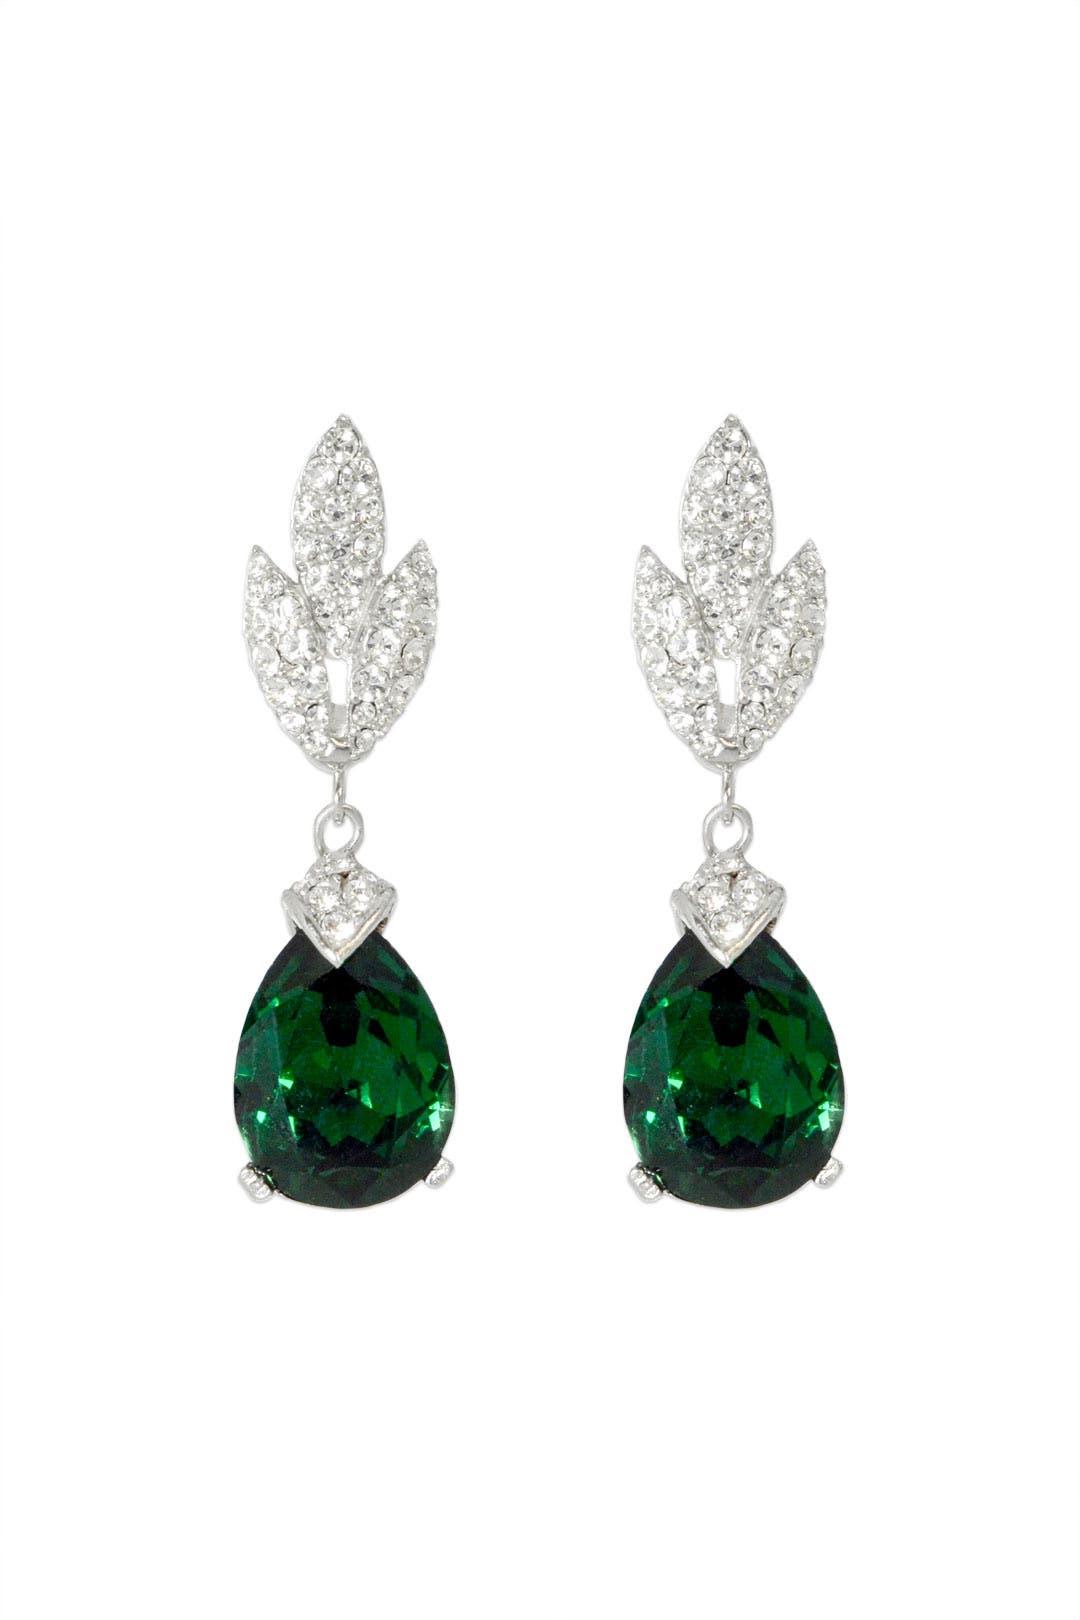 Gachala Emerald Drops by Ciner